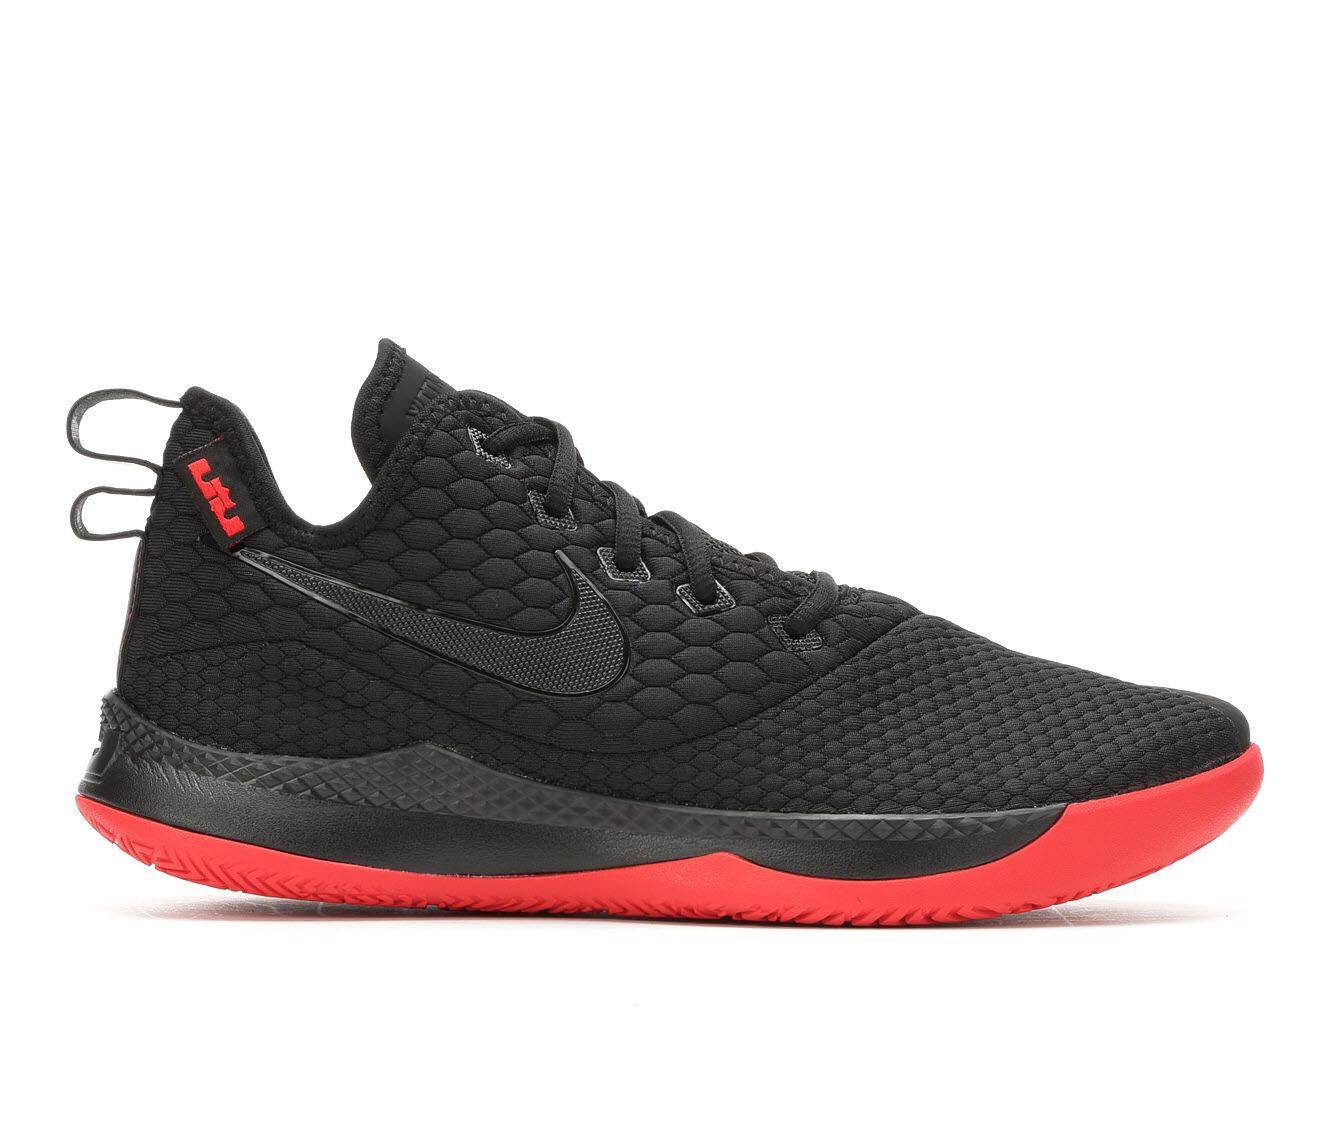 Men's Nike Lebron Witness III Basketball Shoes Black/Red